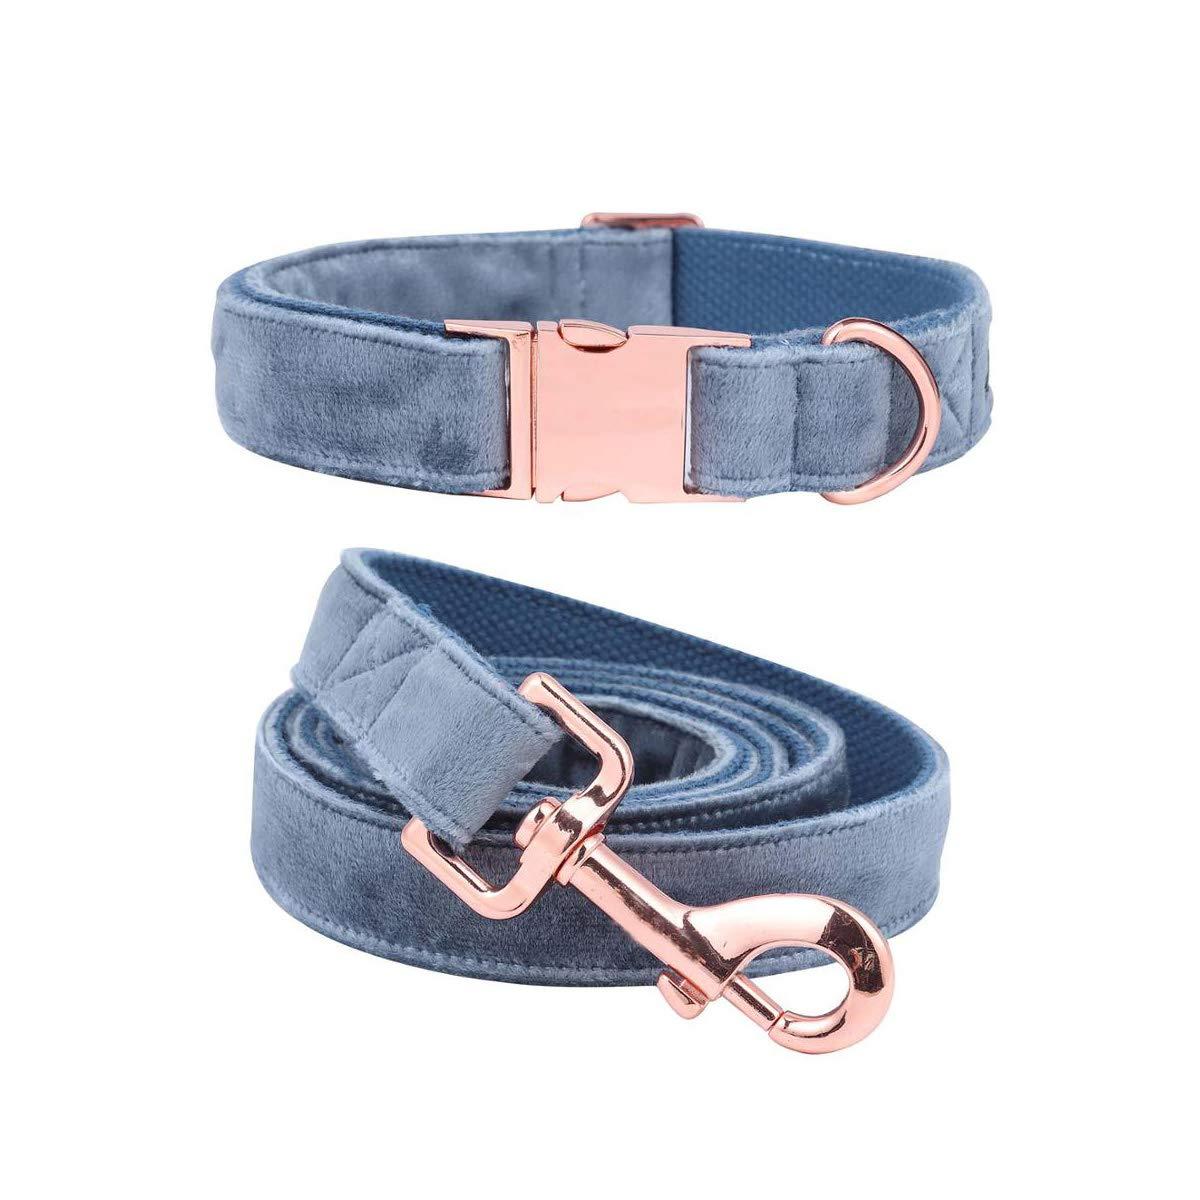 Collar and leash XS collar and leash XS Jesiceeal Christmas Dog Collar and Leash Set Designer bluee Velvet Adjustable Dog Collars for Big Dog Collar and Leash XS